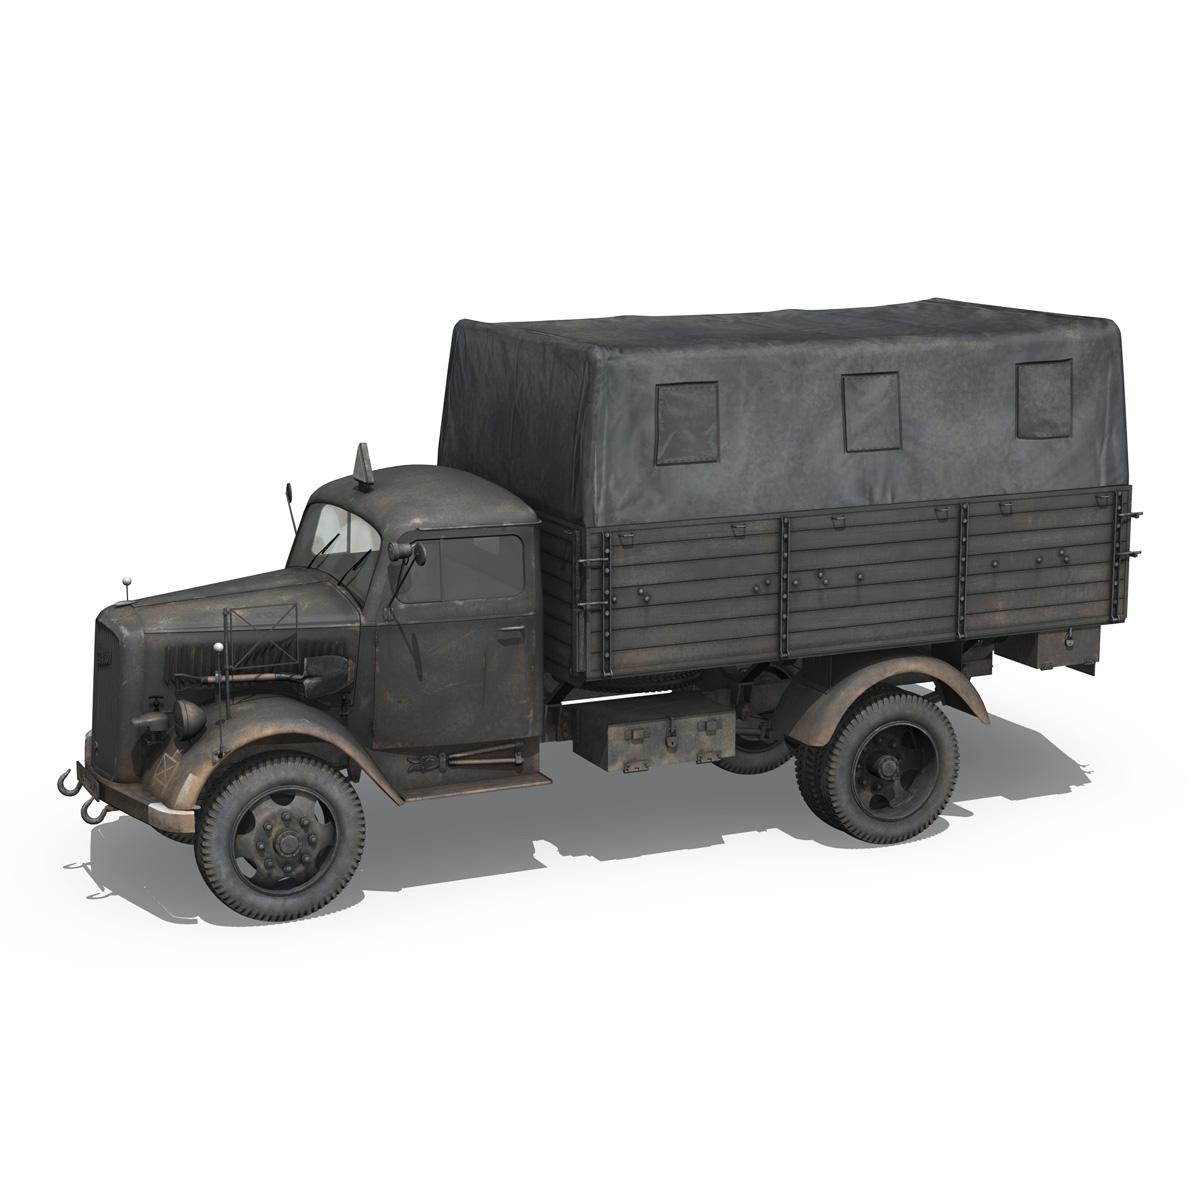 blitz opel - lori cargo 3t - 17 pzdiv model 3d 3ds fbx c4d lwo obj 197198